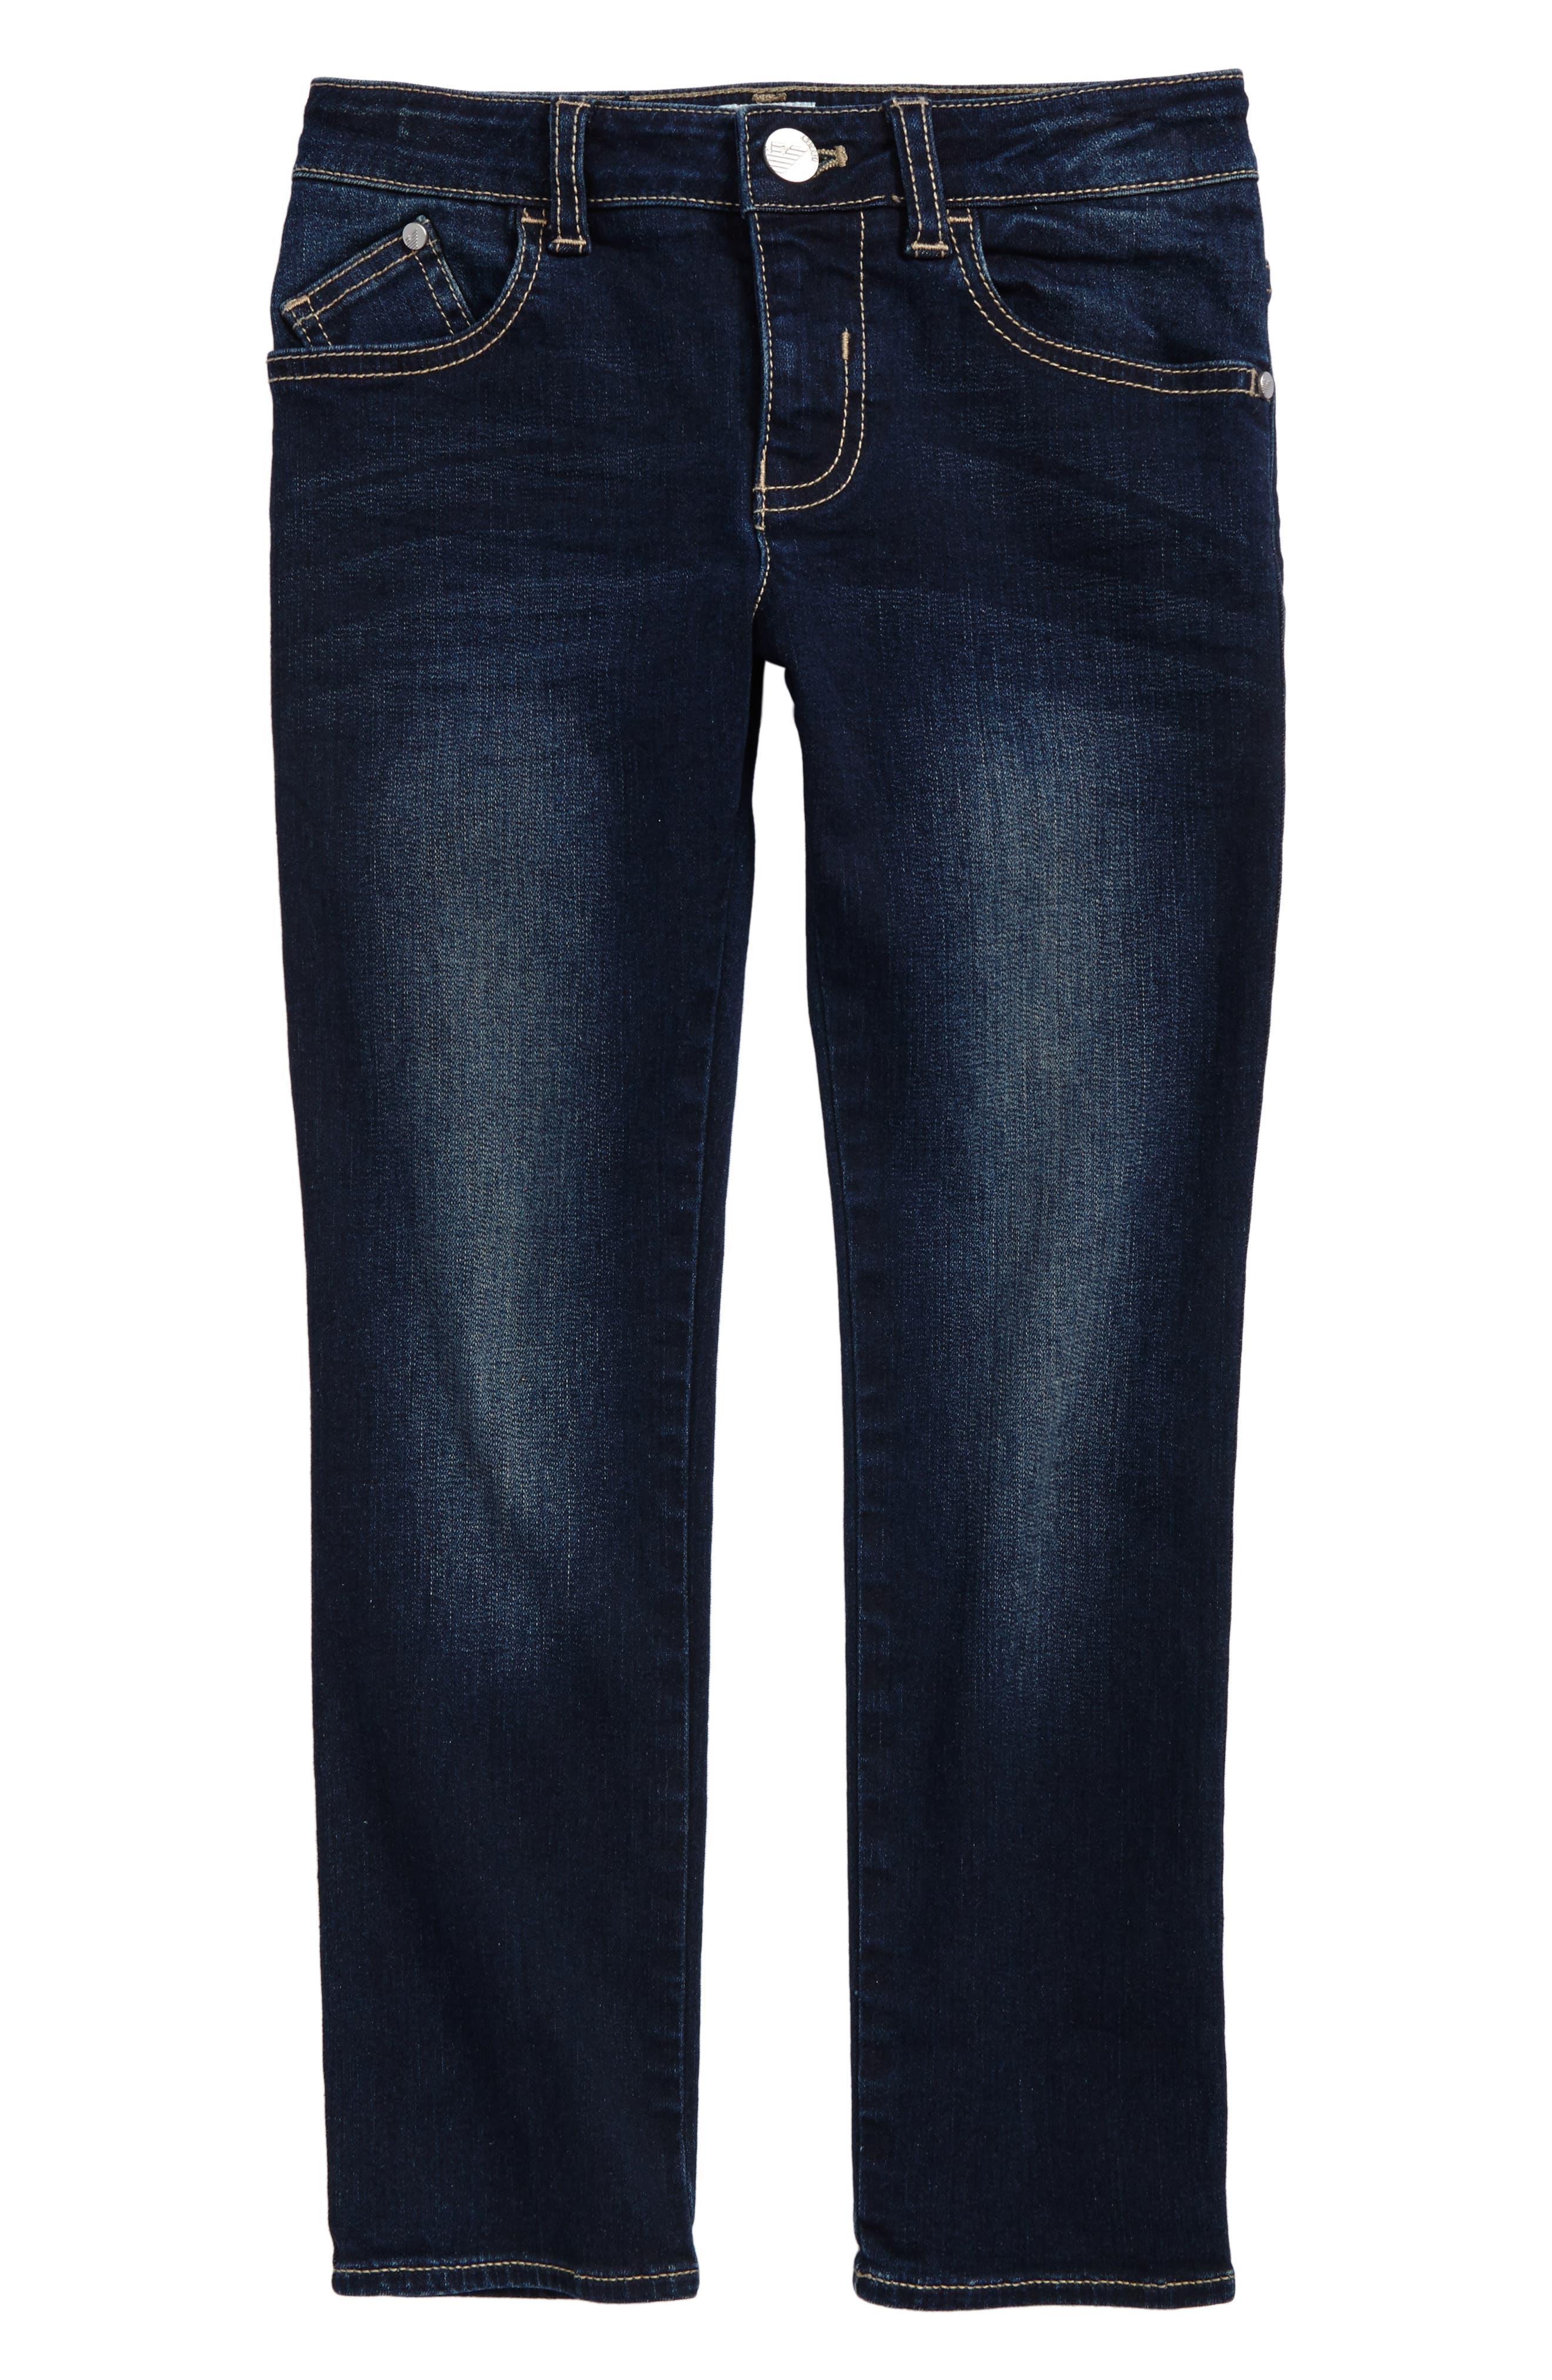 Straight Leg Jeans,                             Main thumbnail 1, color,                             424